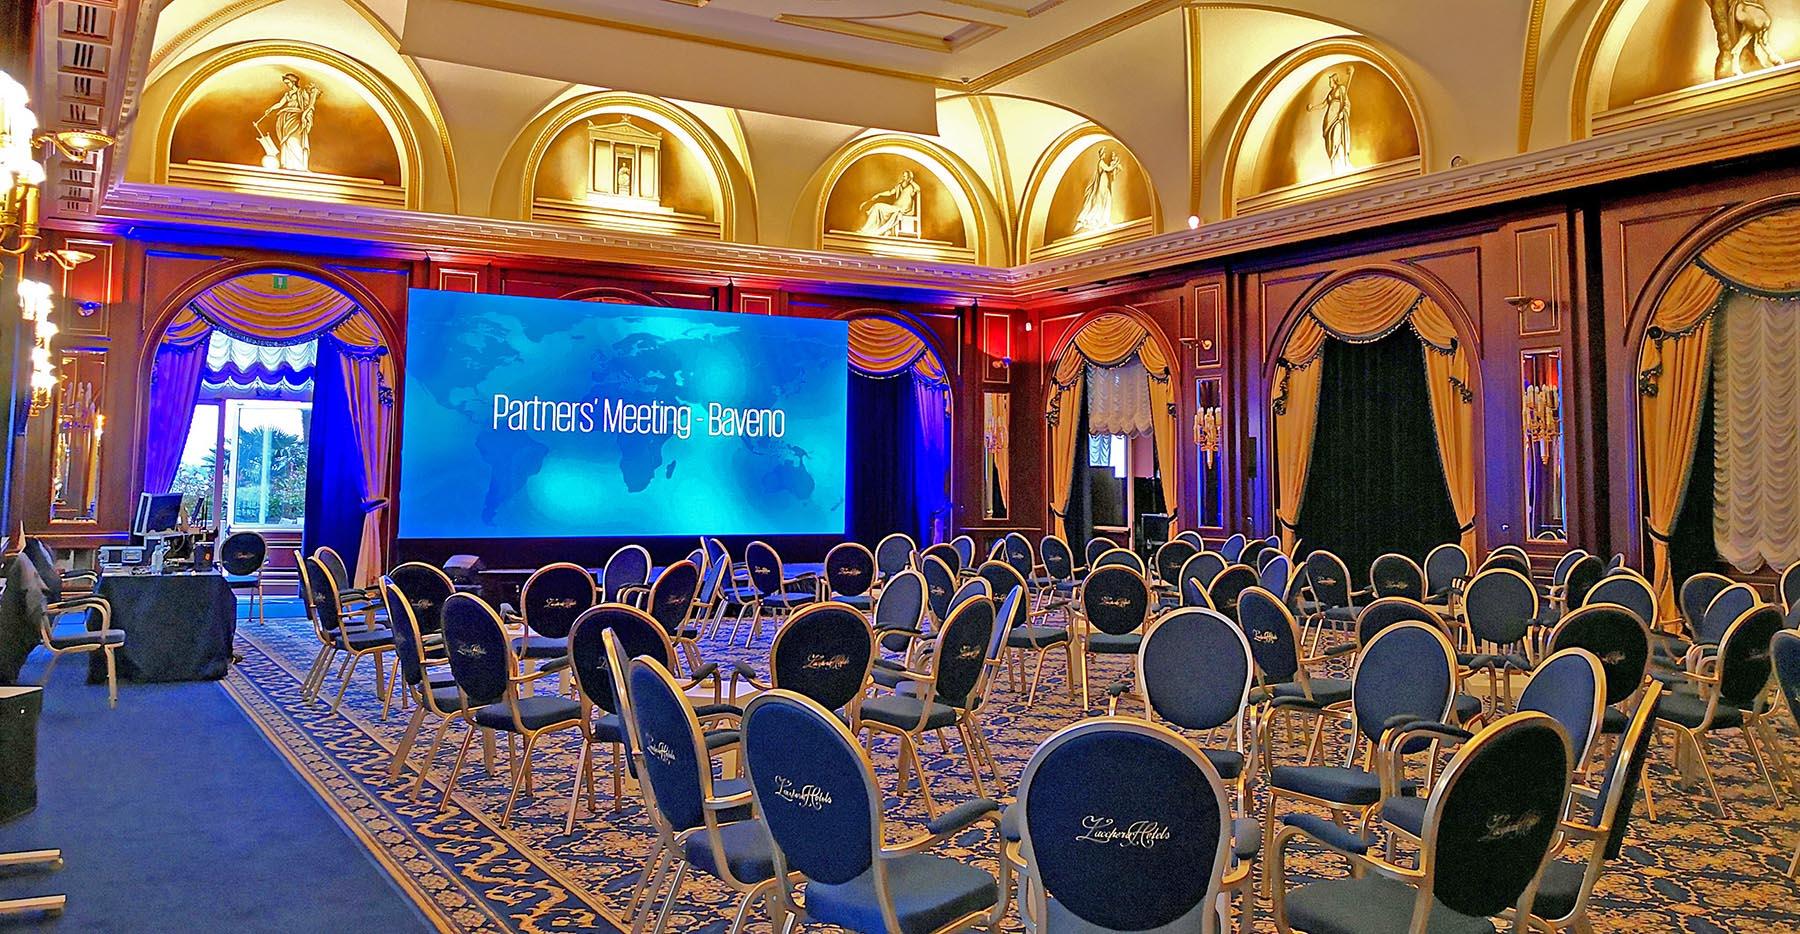 noleggio ledwall per eventi, congressi, convention